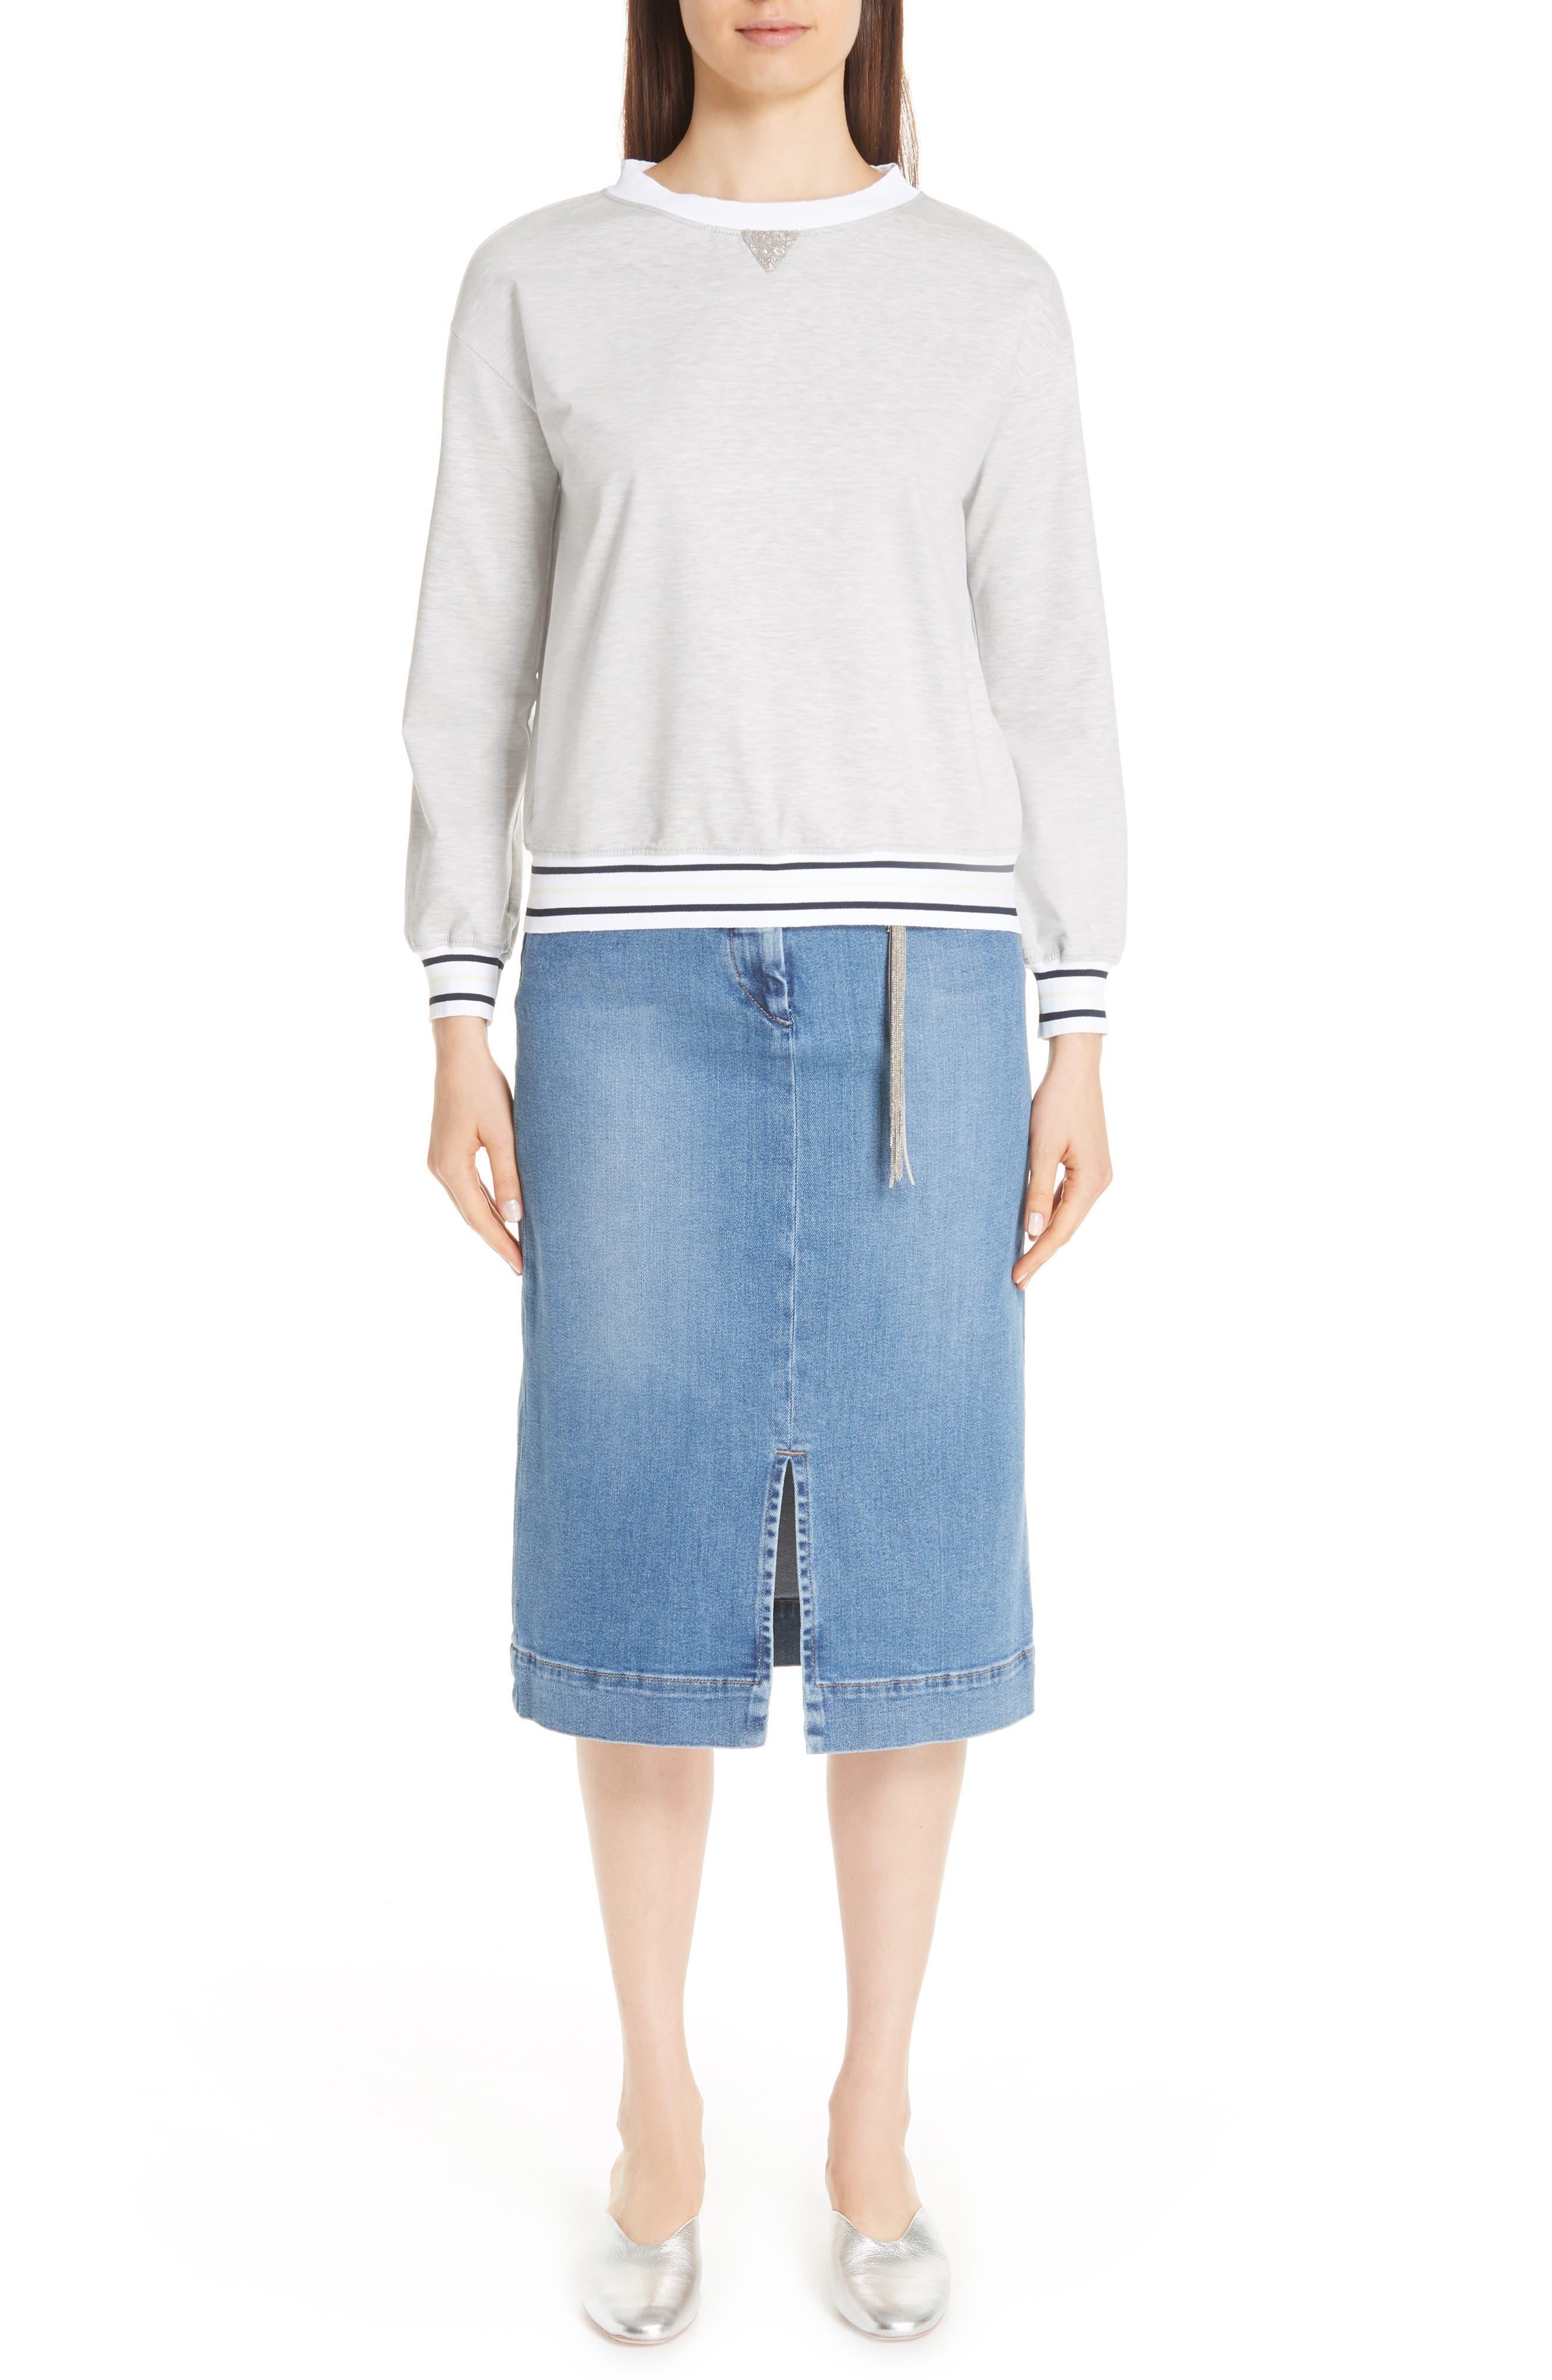 Fabiana Filippi Chain Detail Sweatshirt, 8 IT - Grey